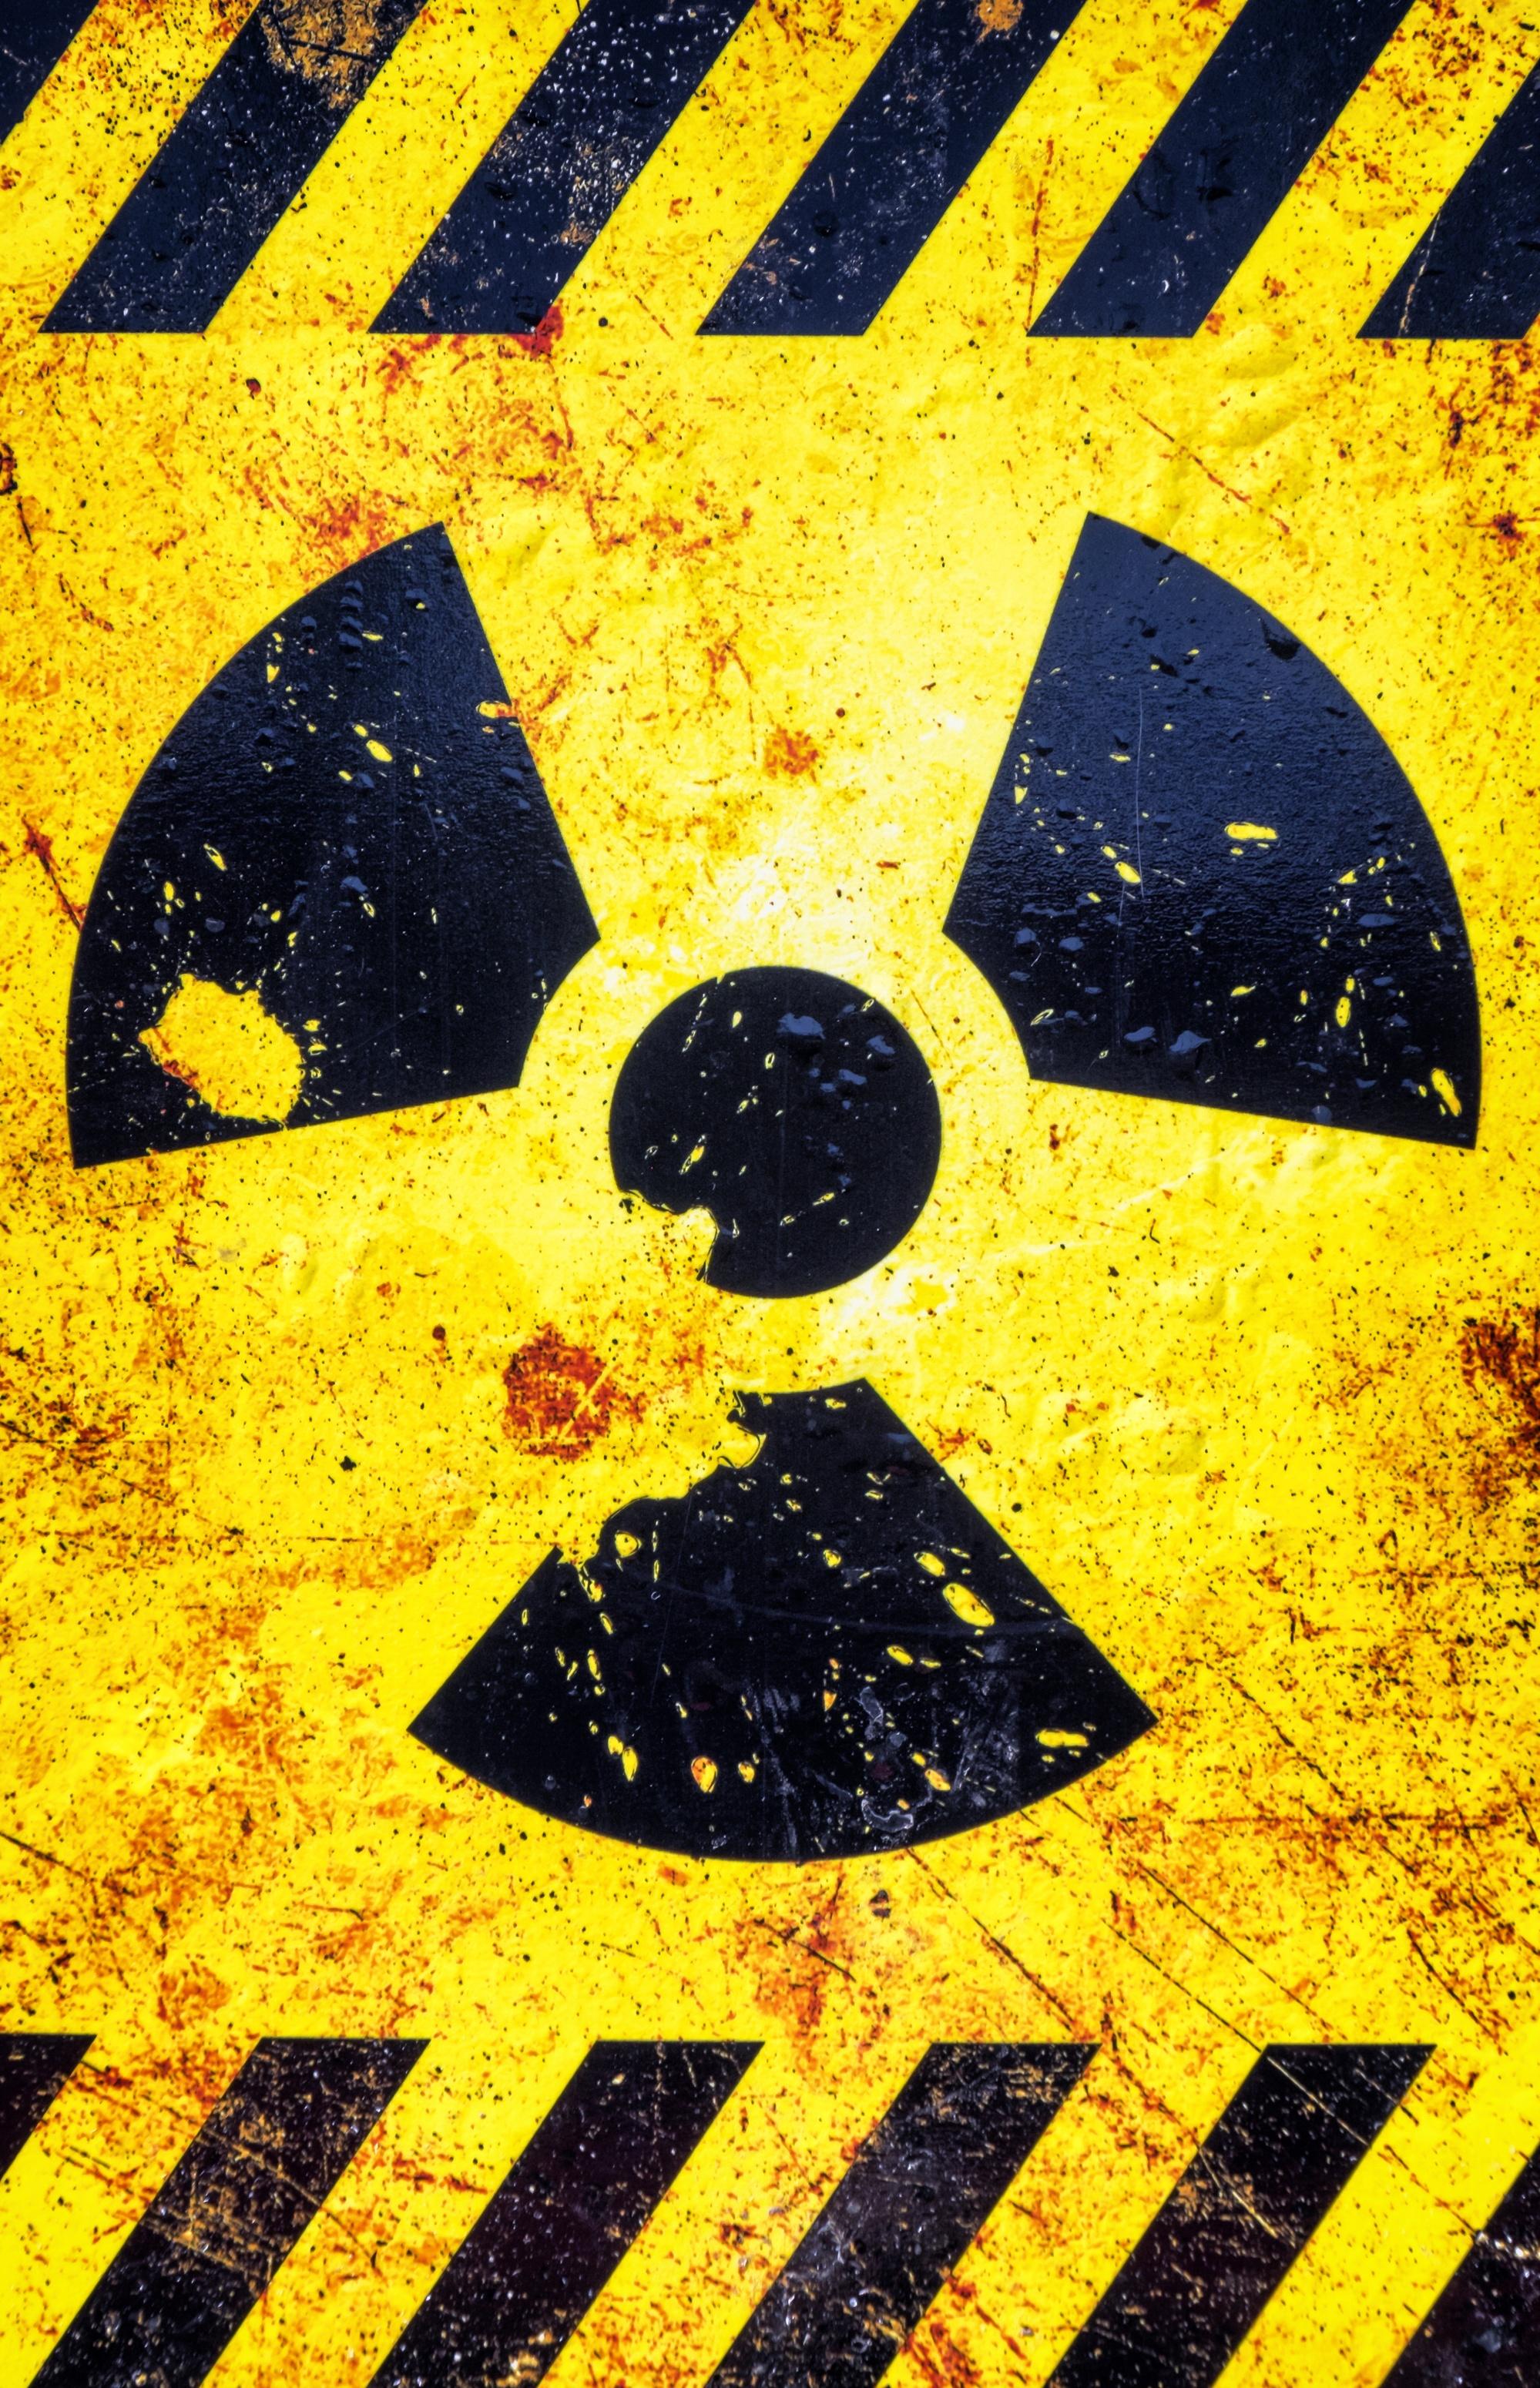 Ohio Radon Testing and Inspection Company